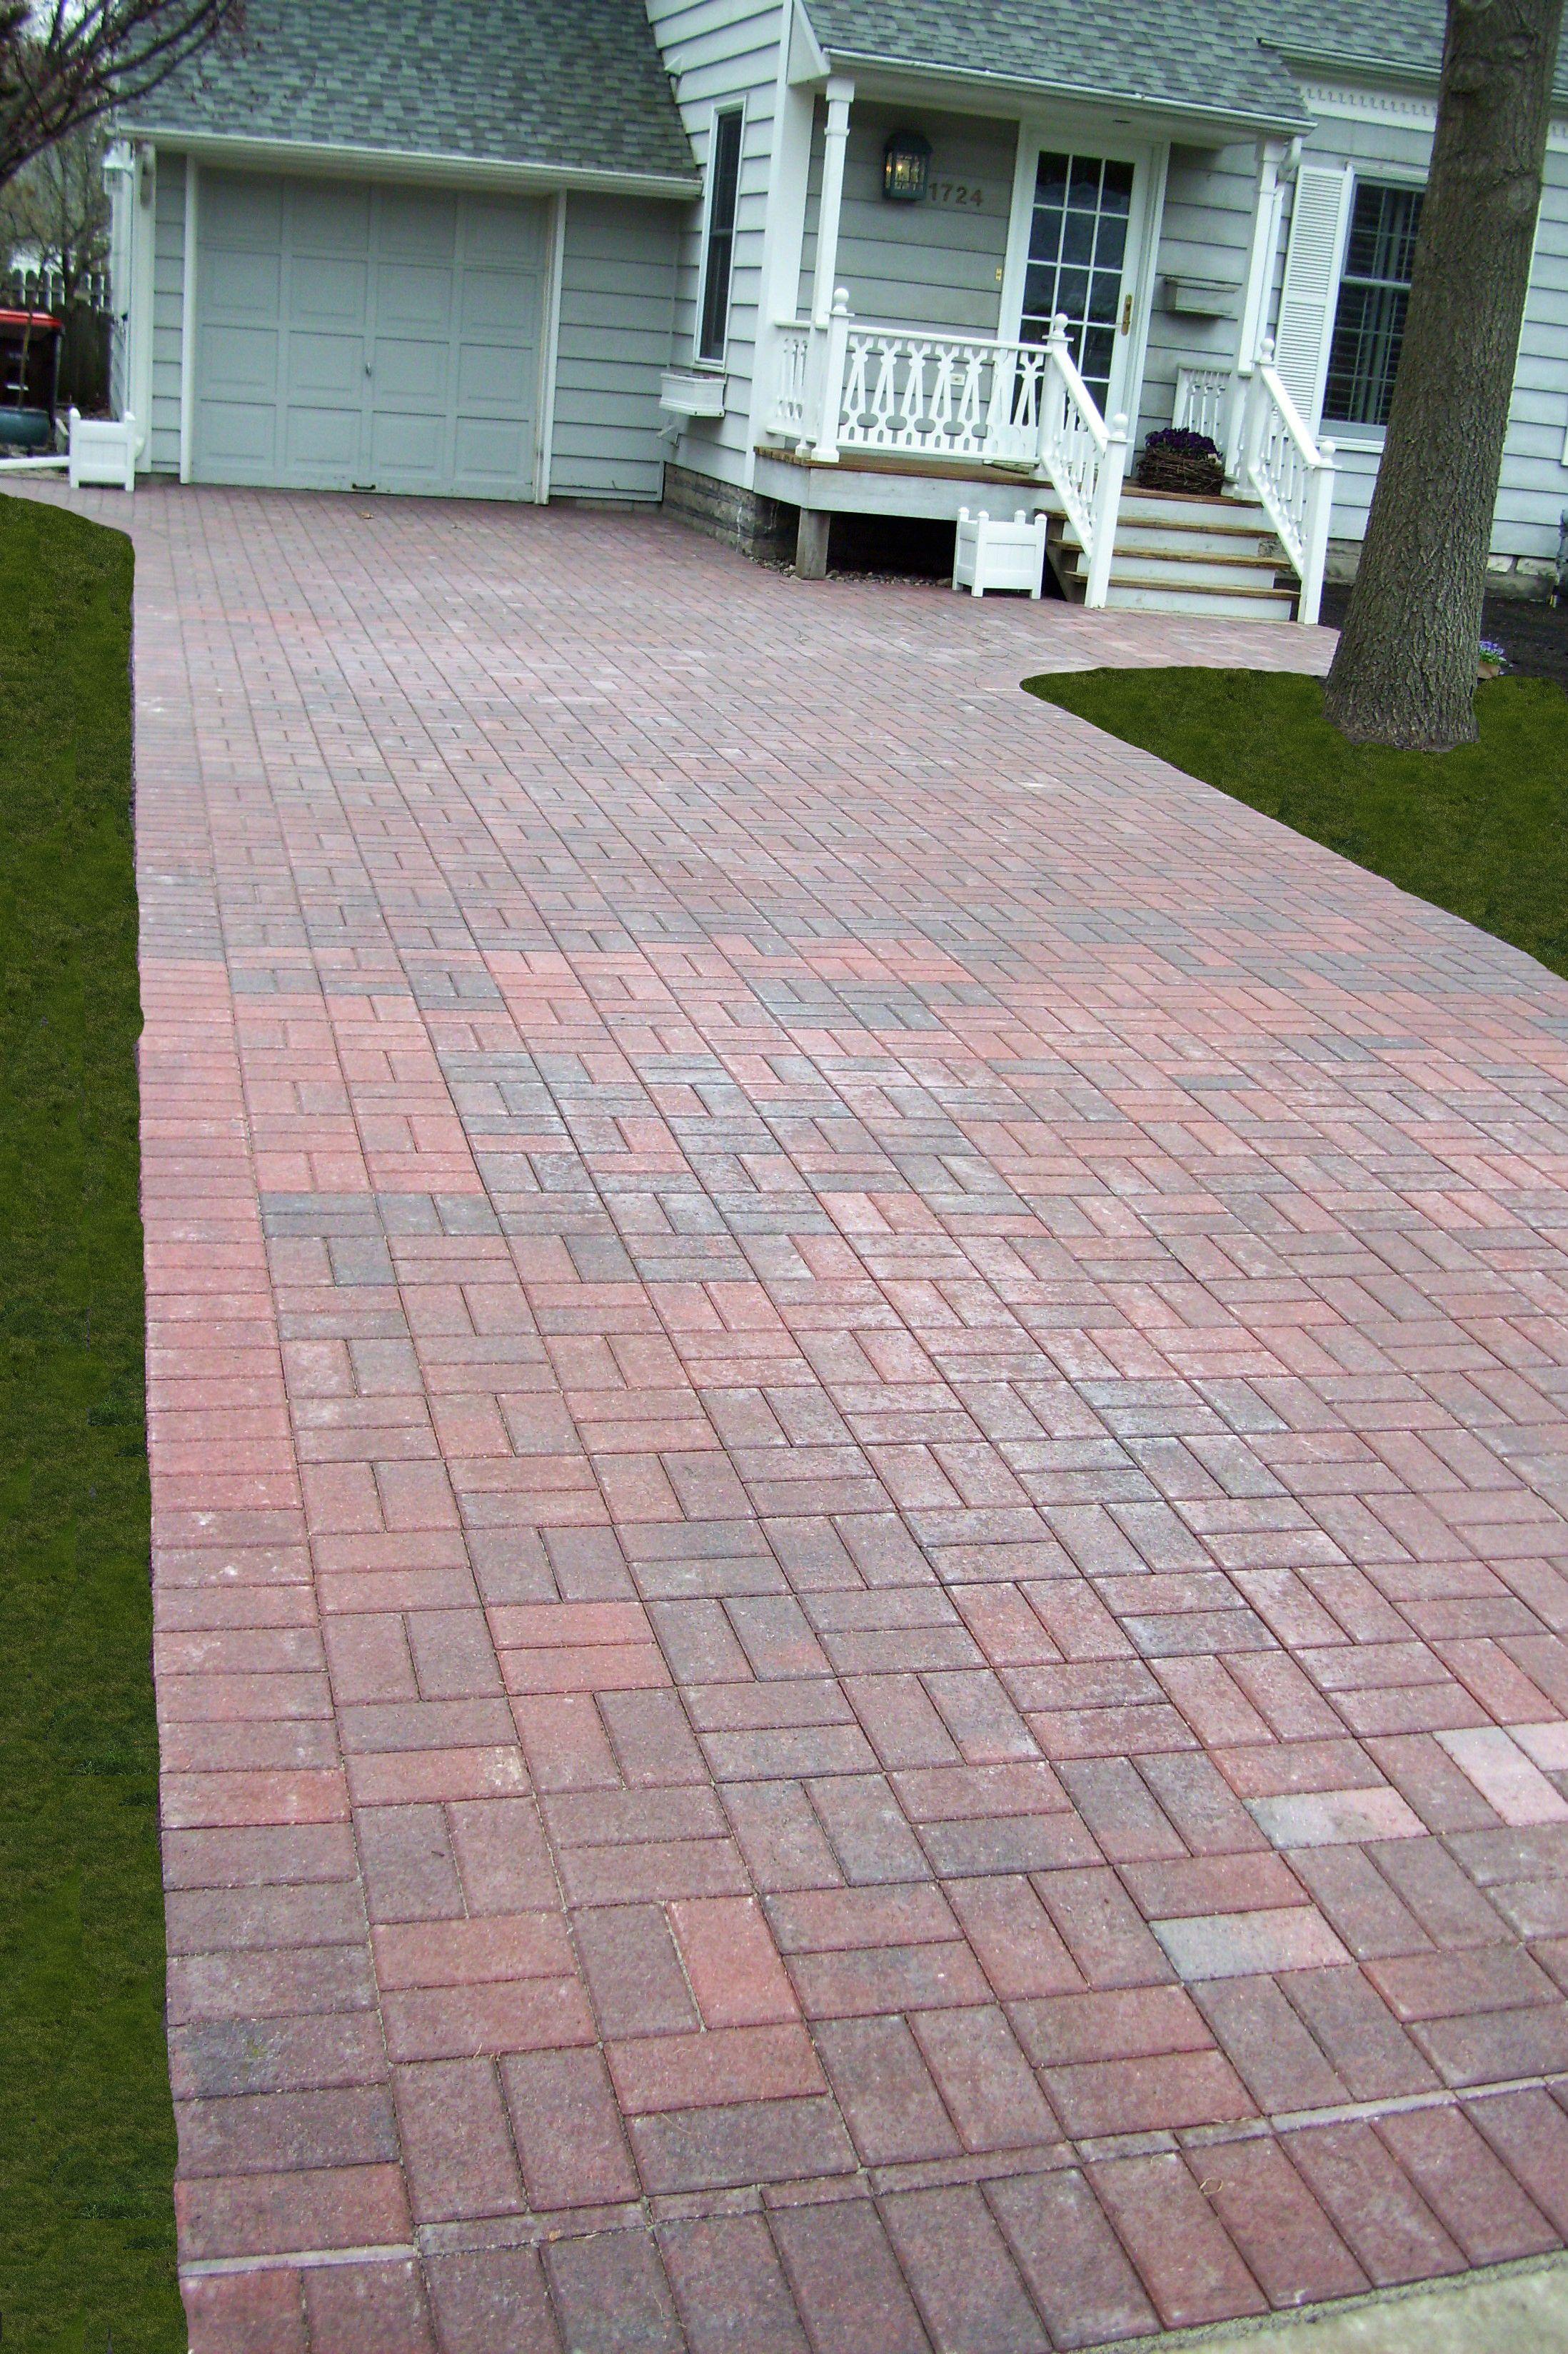 Red Charcoal Color Holland Paver Driveway Basket Weave Pattern Brick Paver Patio Patio Pavers Design Brick Patios